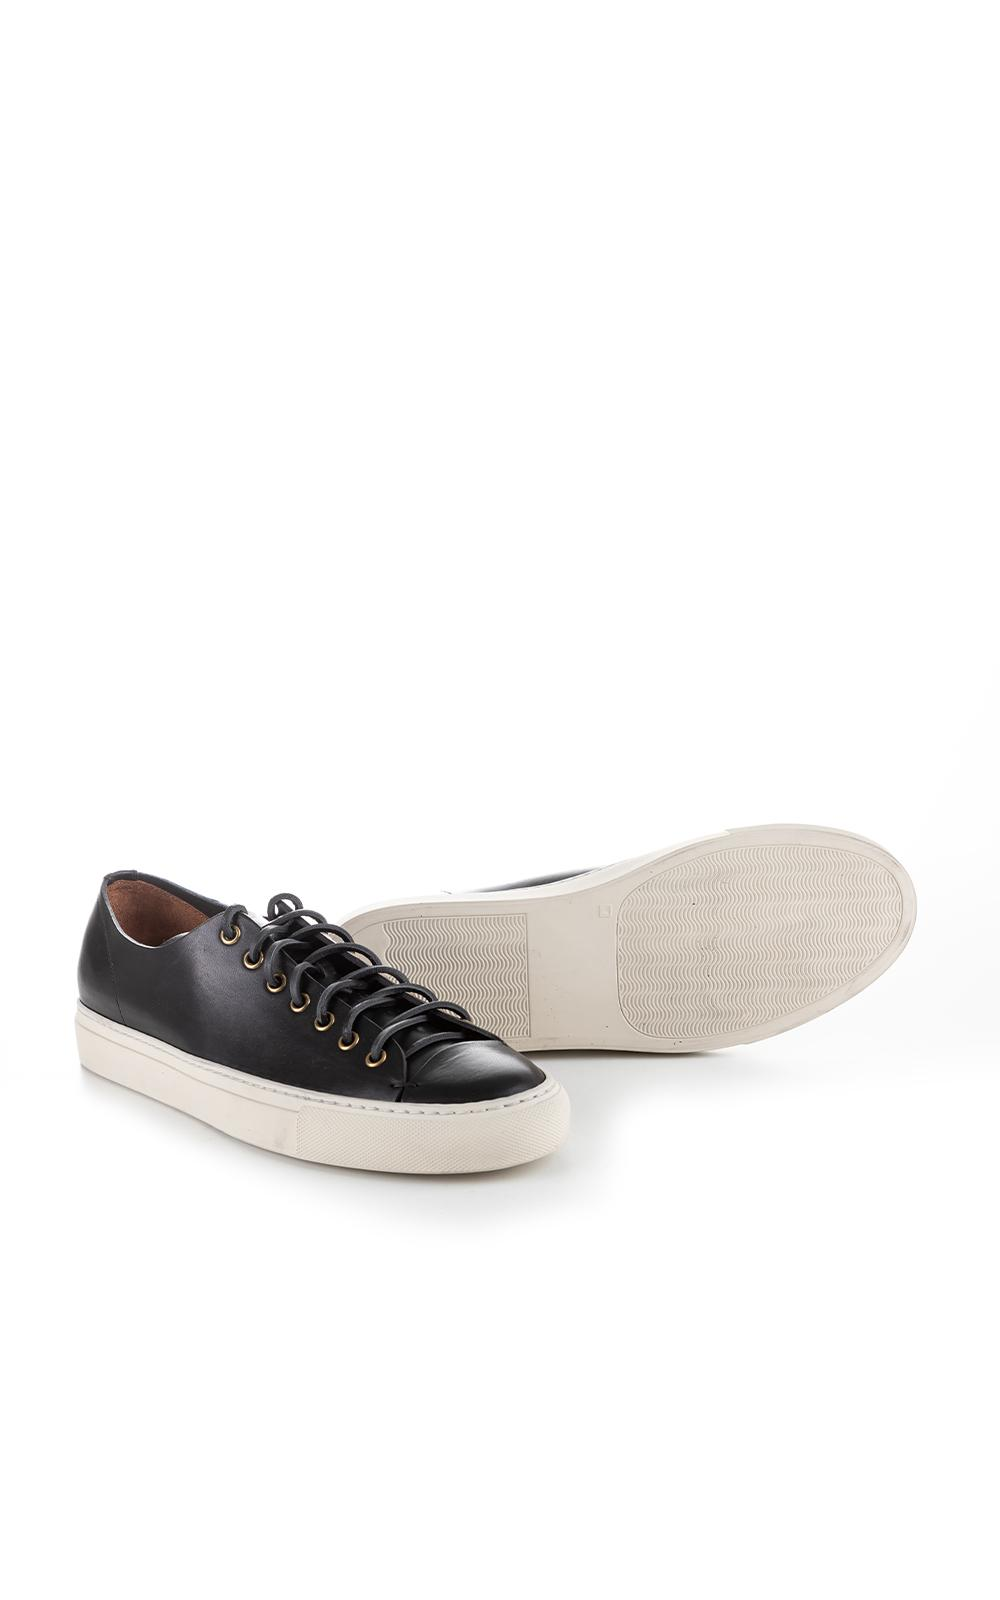 Buttero Leather B4006 Tanino Low Sneaker Black for Men